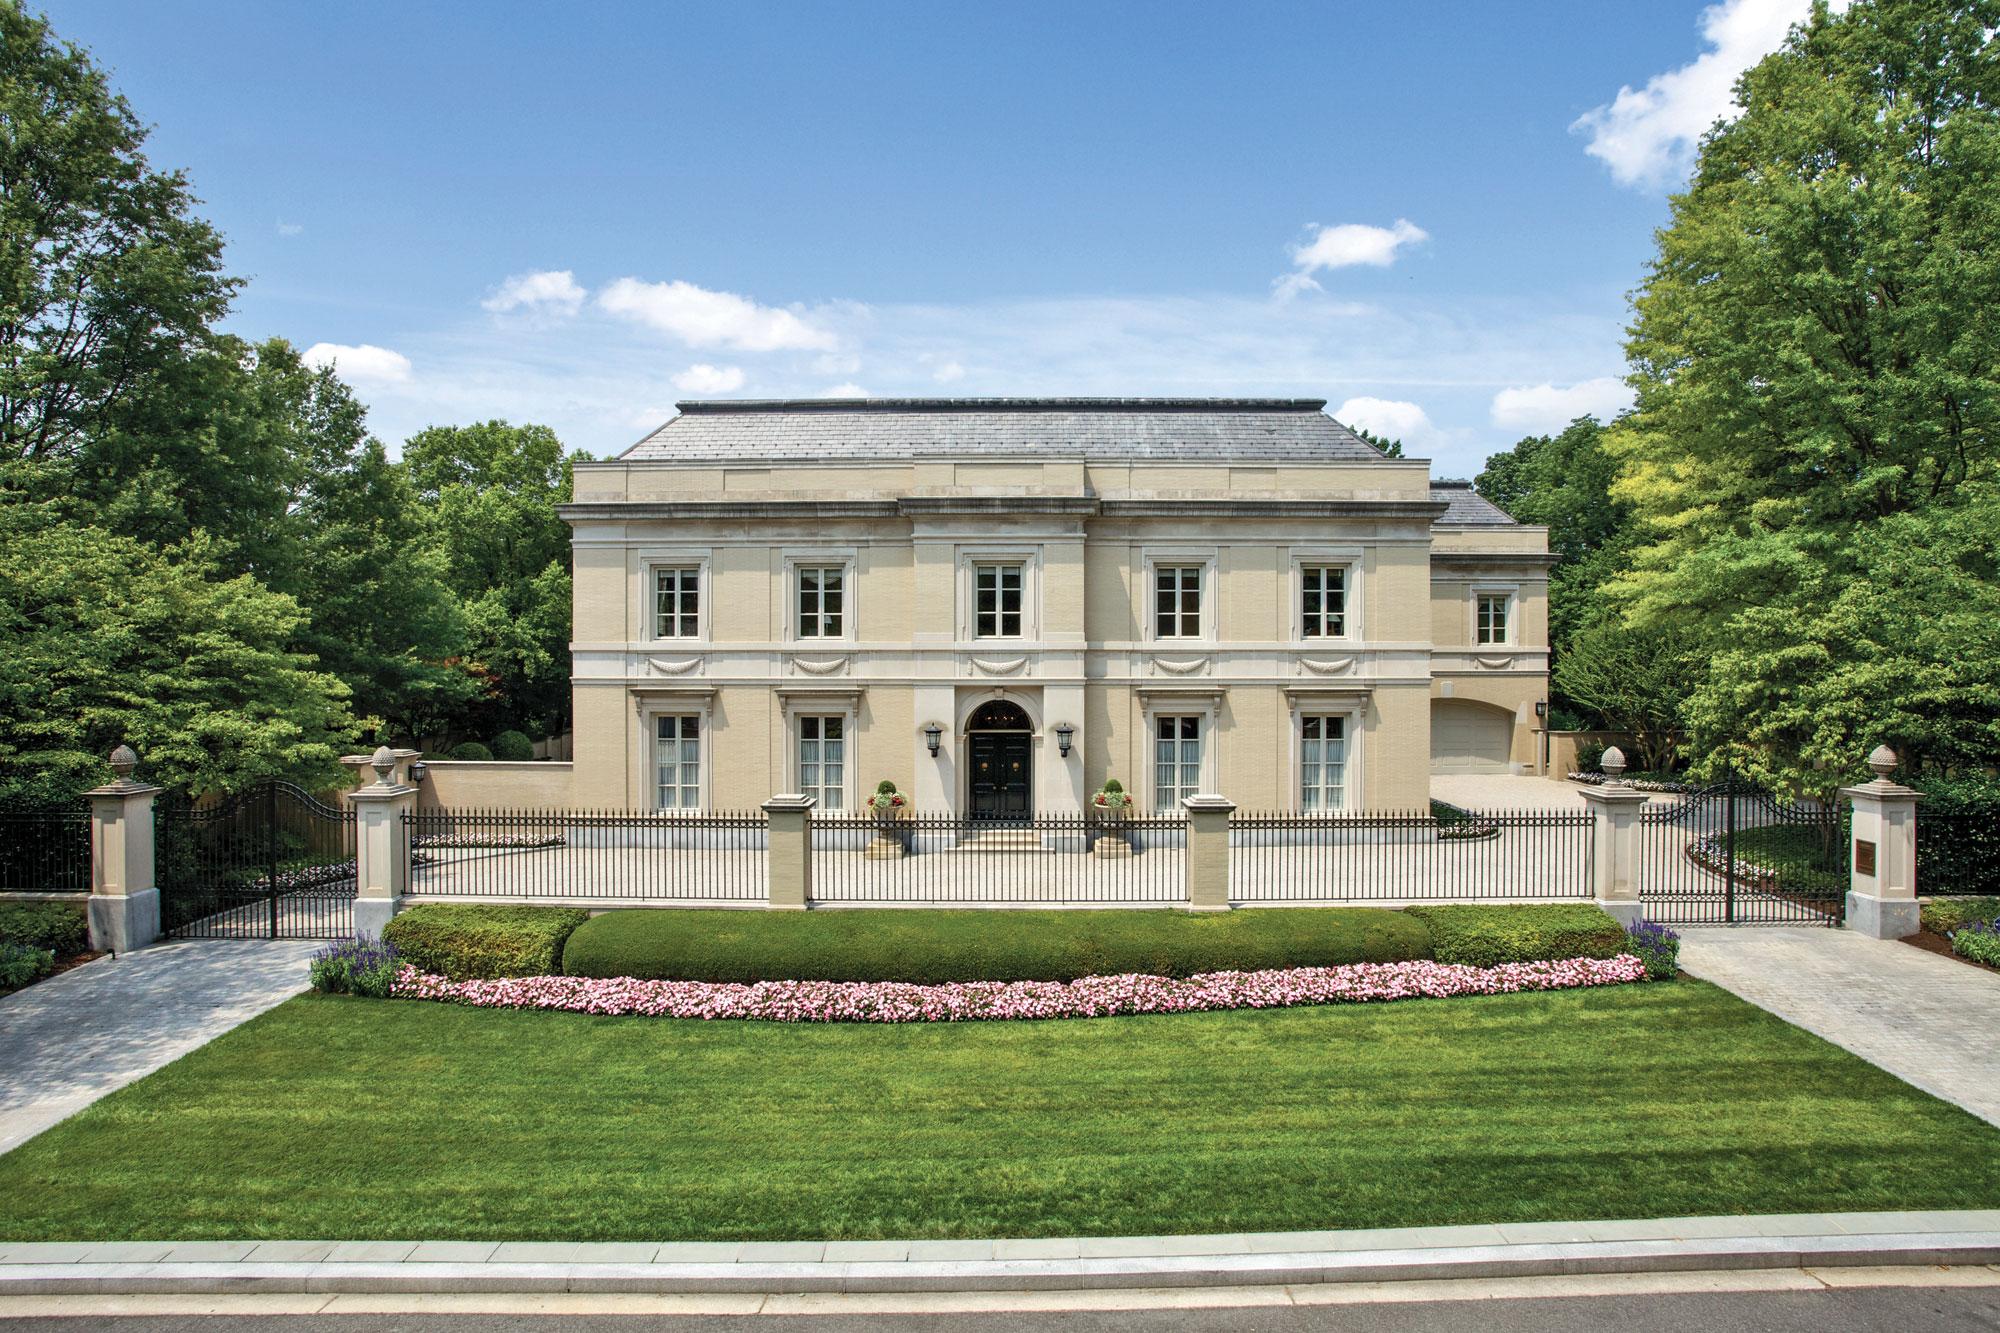 Fessenden House, Washington, D.C.